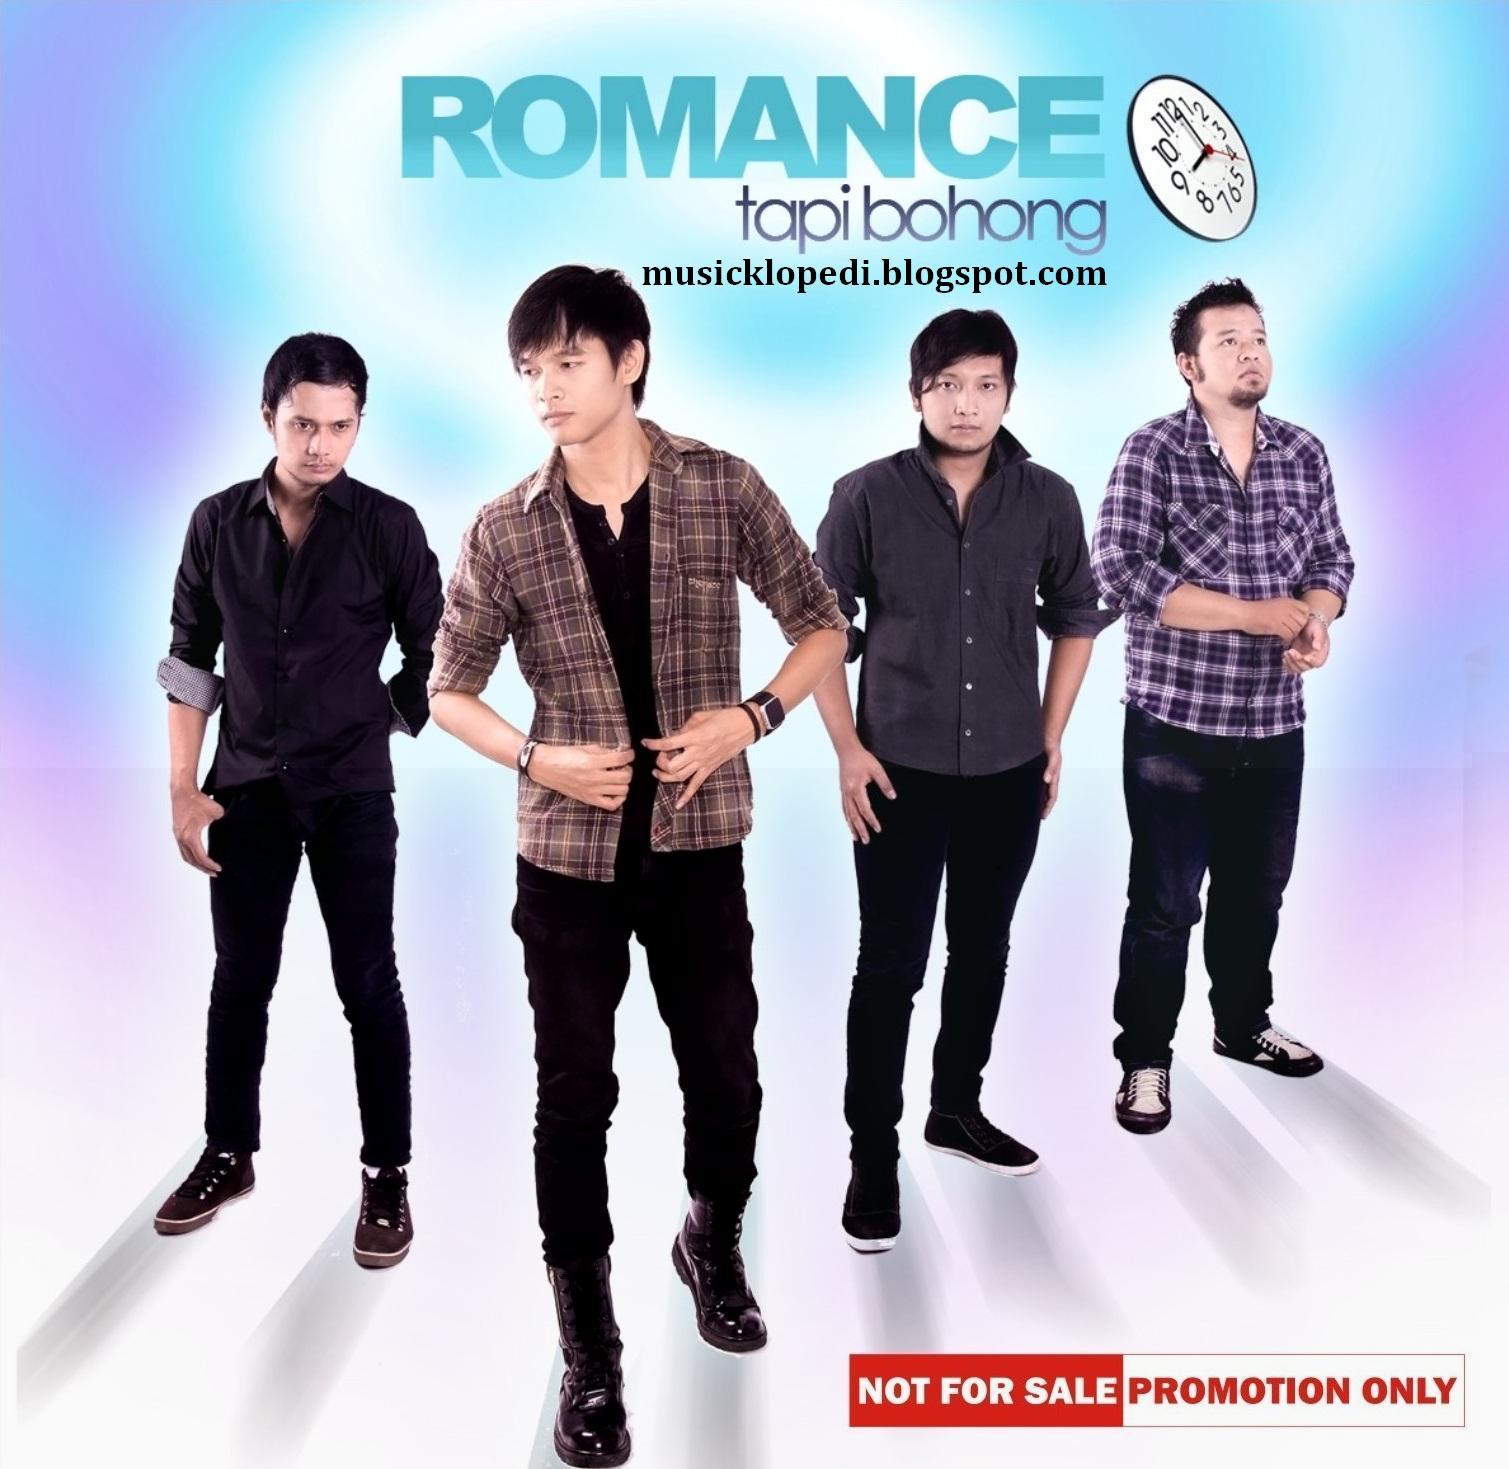 Karna Su Sayang Mp3 Wapka: Lirik Lagu Romance - Tapi Bohong